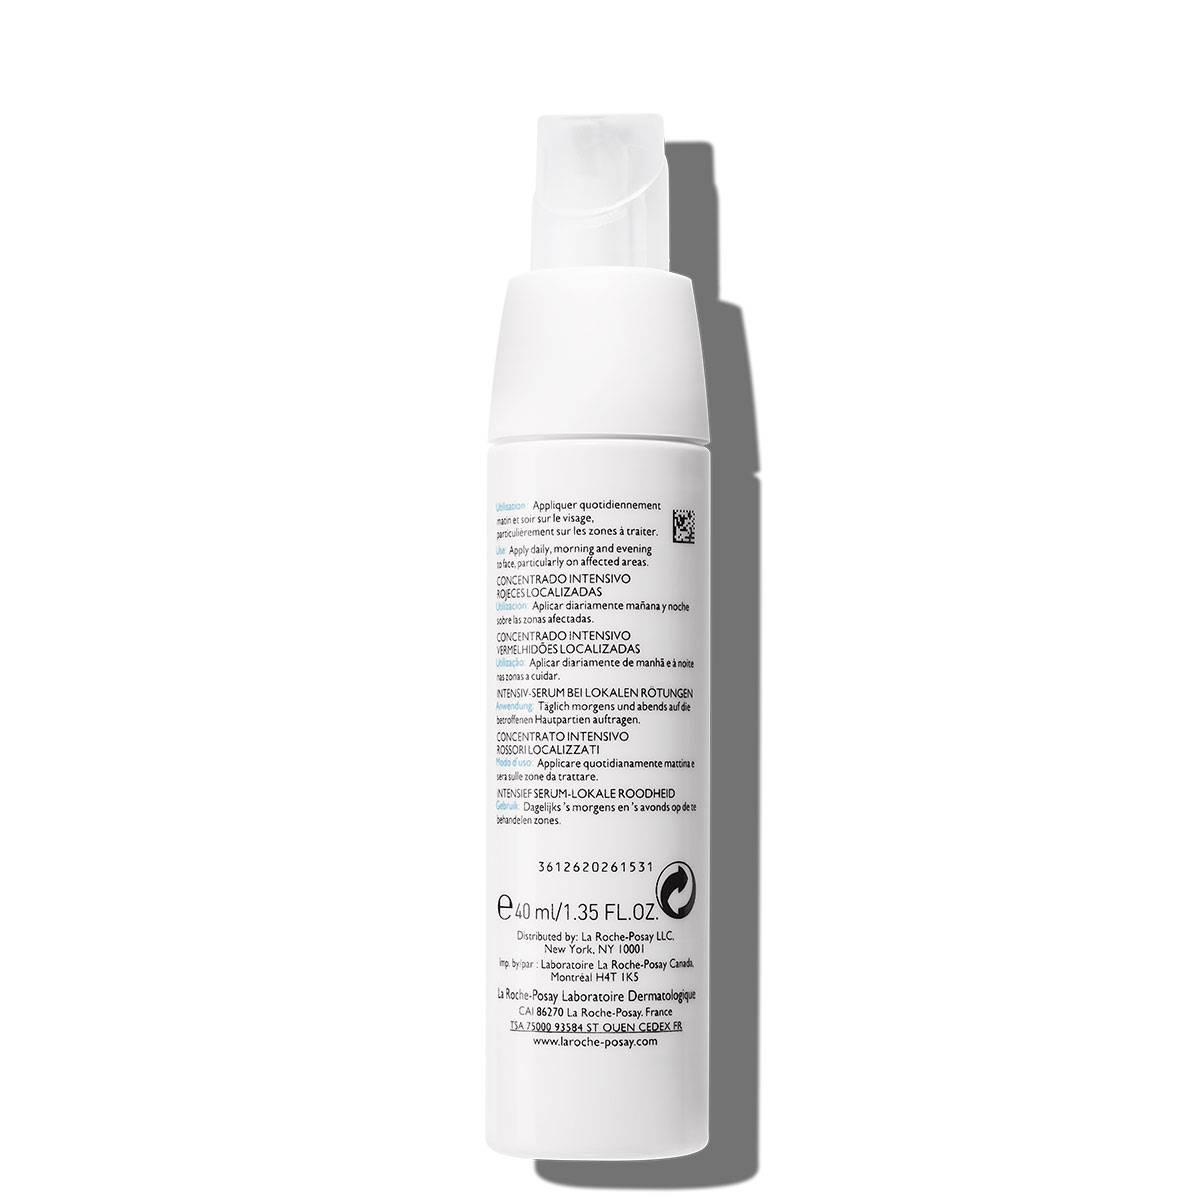 La Roche Posay ProductPage Face Care Rosaliac AR Intense 40ml 33378724